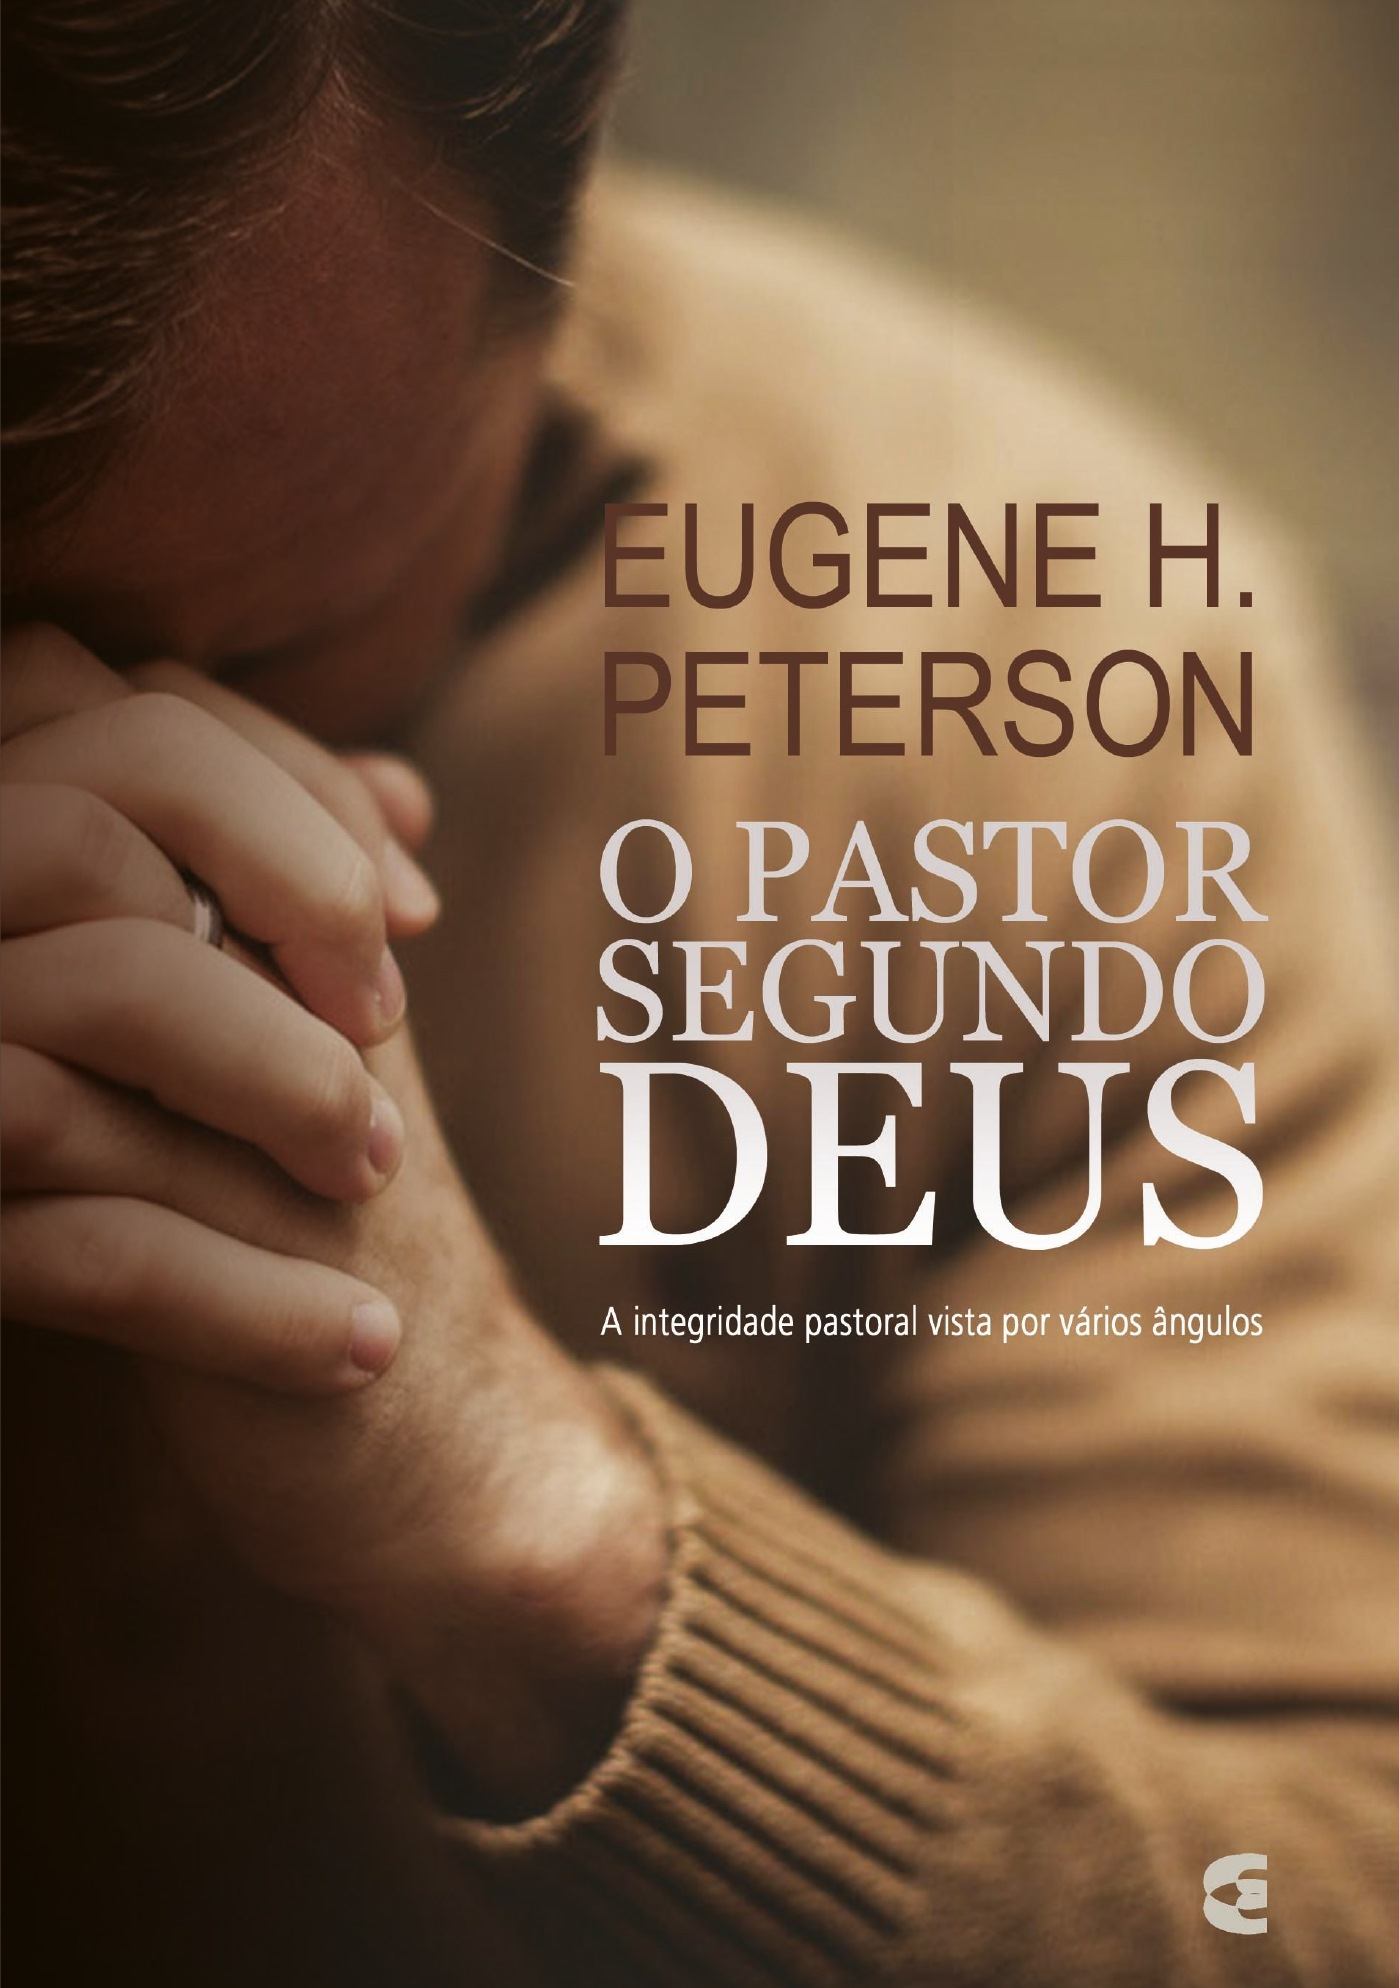 O Pastor segundo Deus